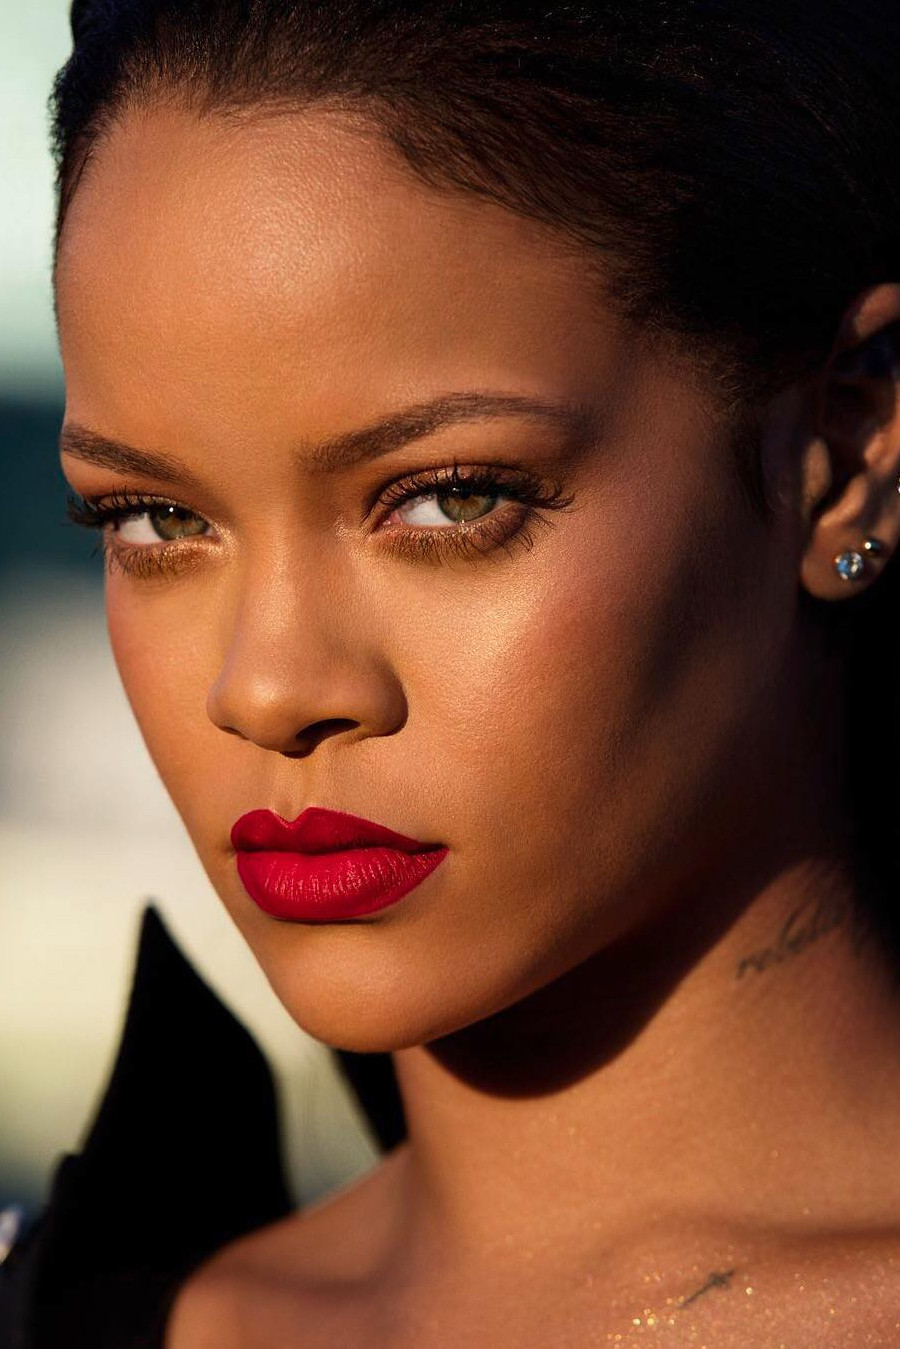 picture Best of the Week: Rihanna's Orange Lip, Kim Kardashian's Birthday Glam,More